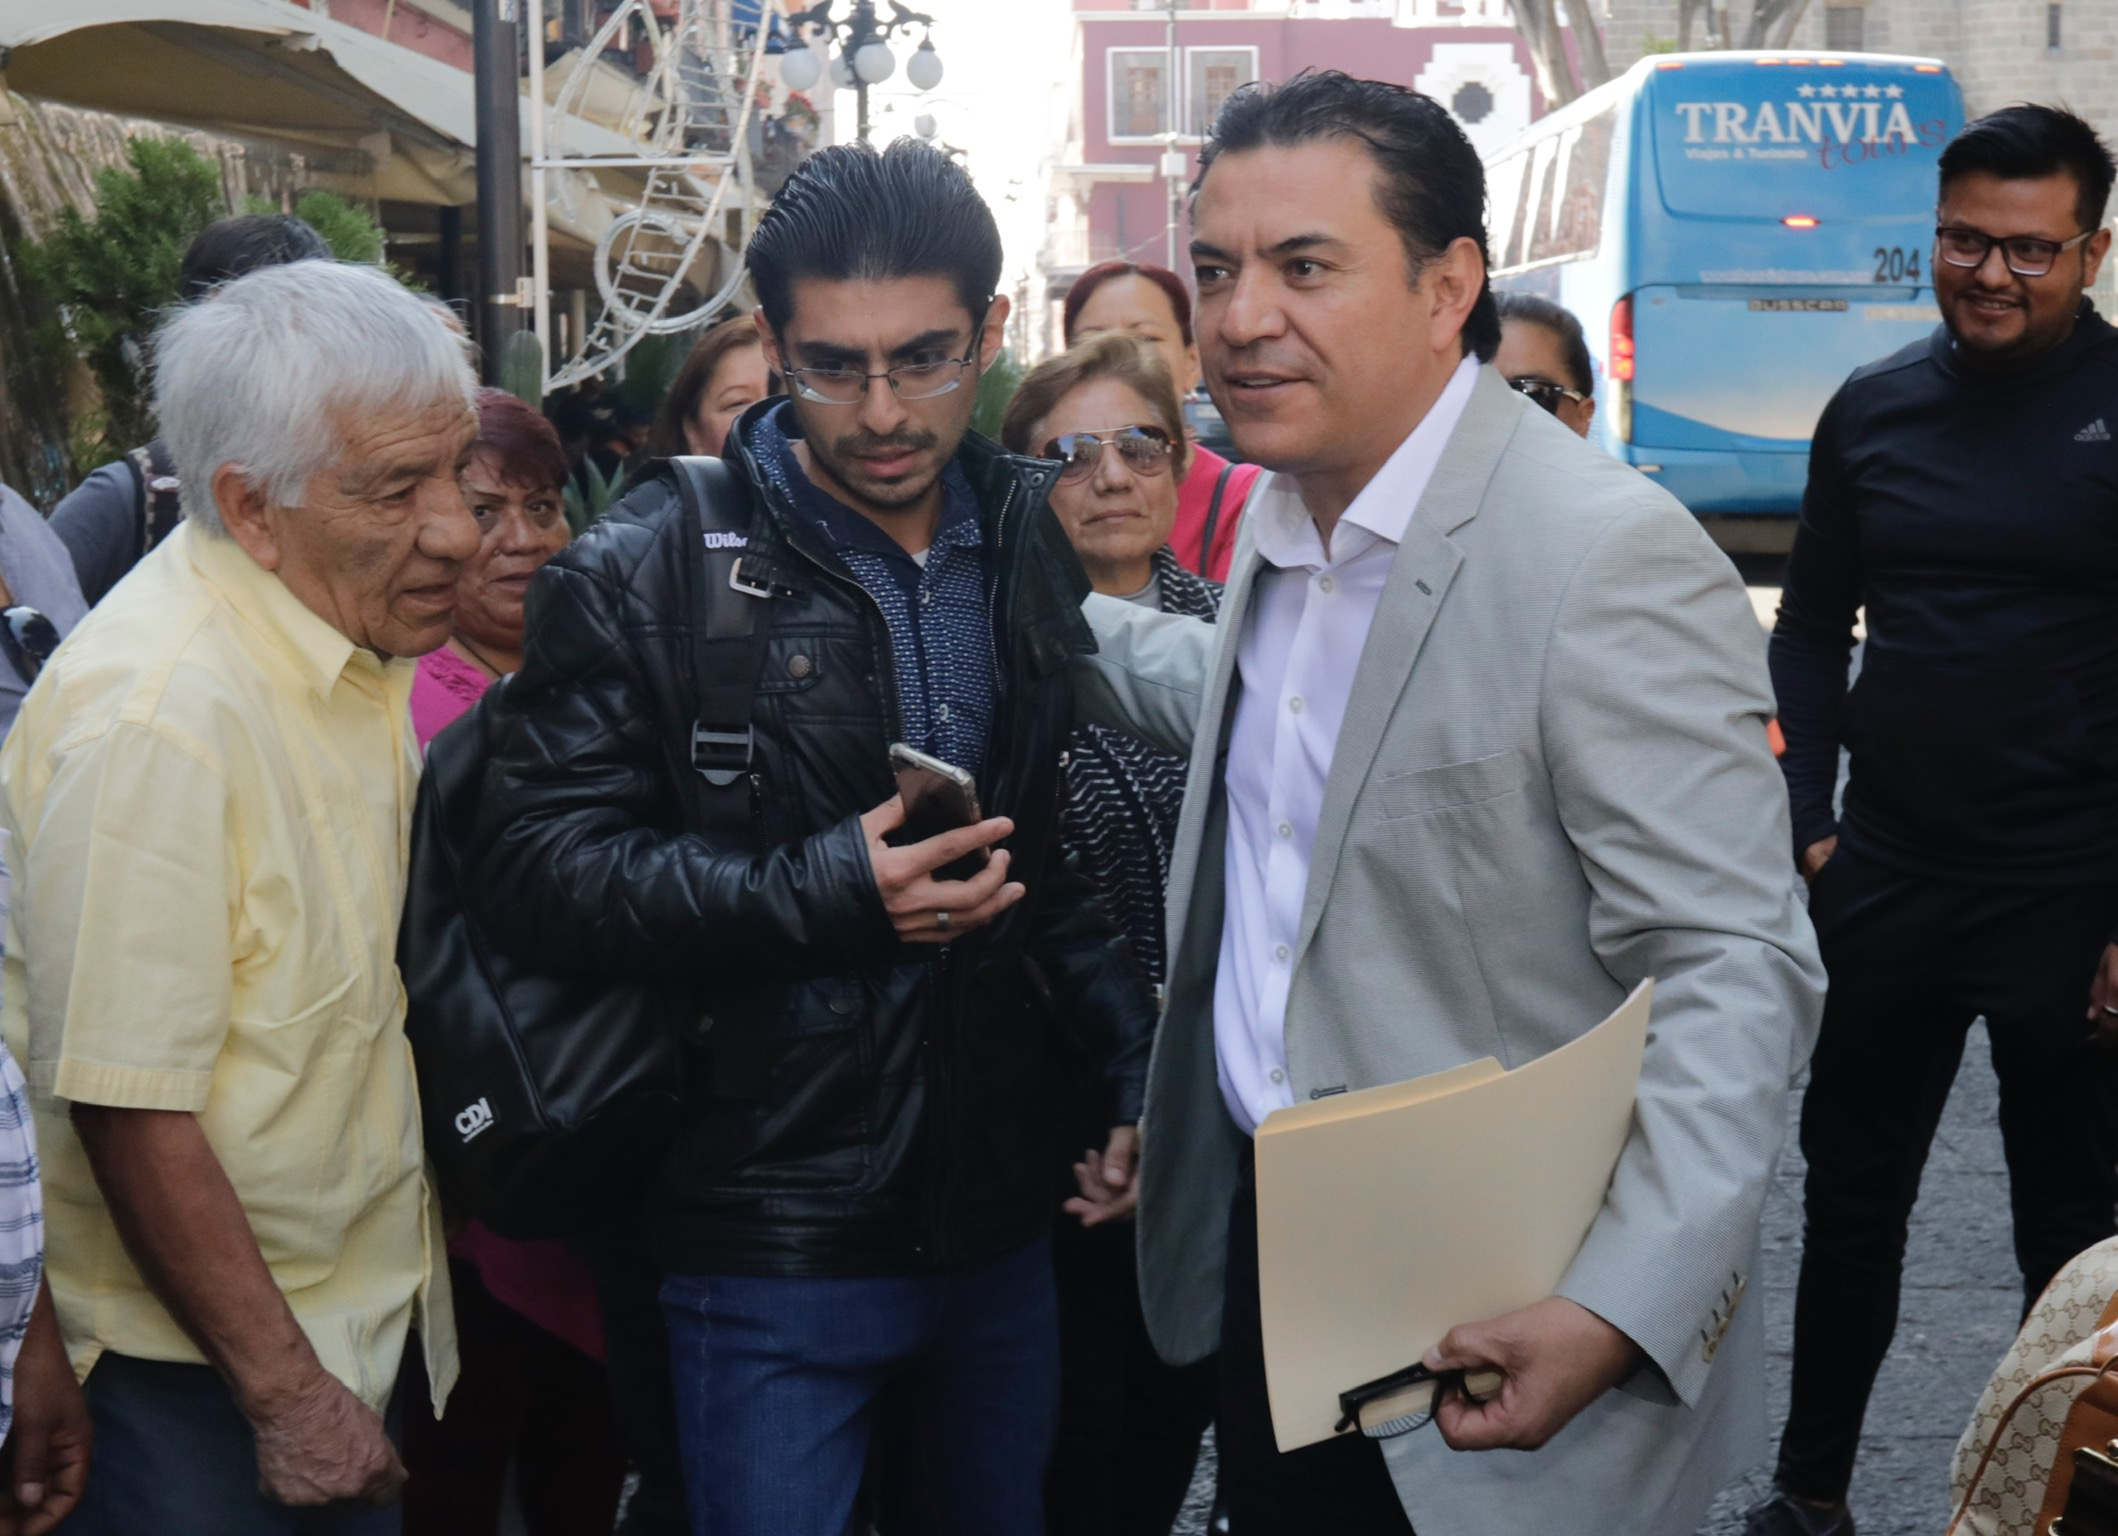 Gobierno capitalino me ataca para ocultar su mal trabajo: Pacheco